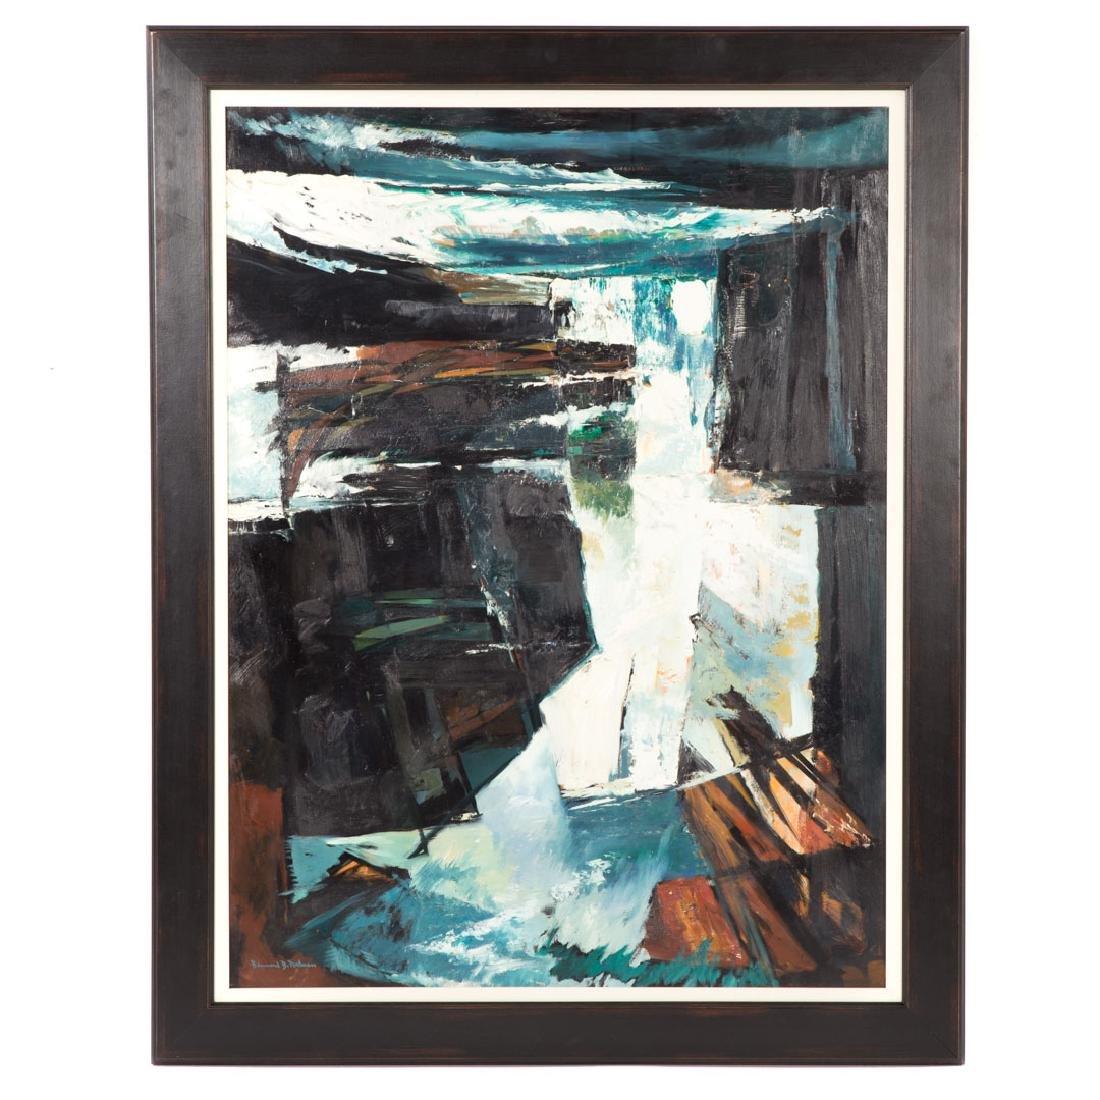 Bennard Perlman. Untitled, oil on board